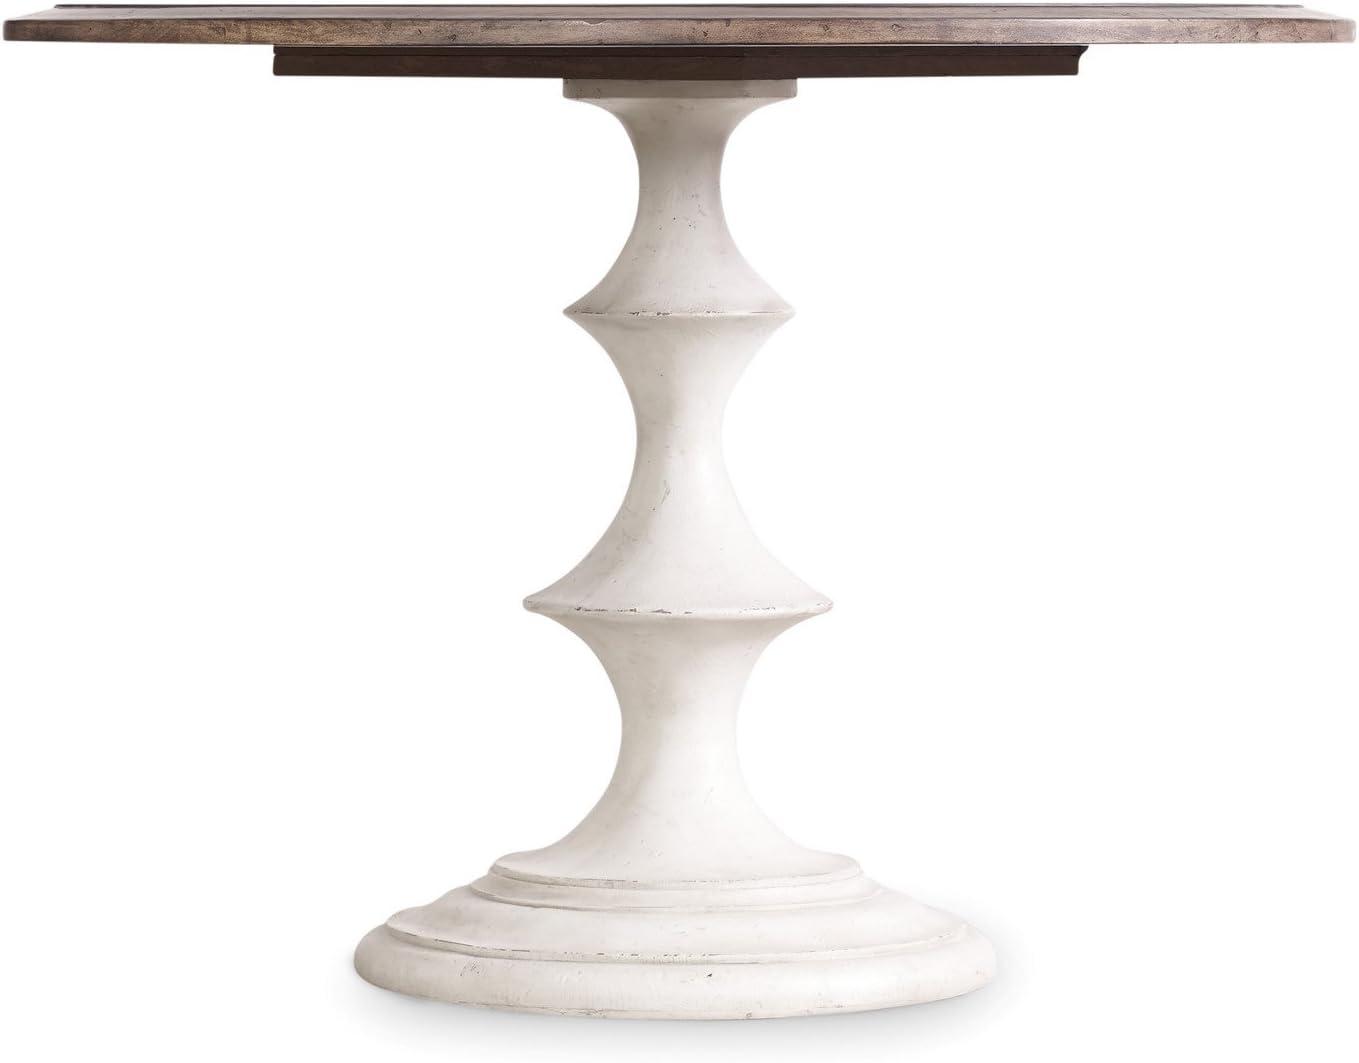 Hooker Furniture Melange Brynlee 42 Round Pedestal Dining Table in Walnut and Distressed White